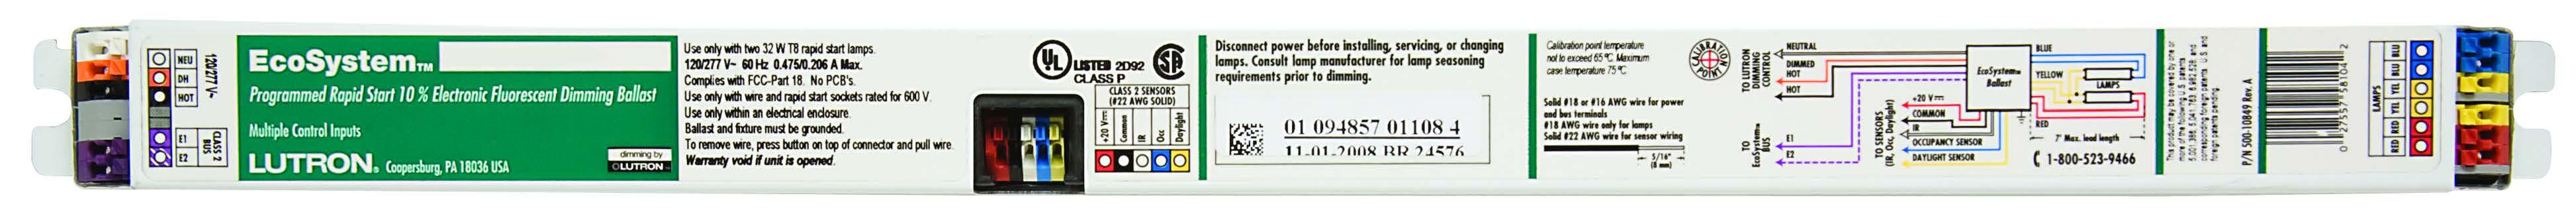 Lutron Ballast Dimming Wiring Diagram Ehdt832mu210 Ec Junv Ho 3892x335